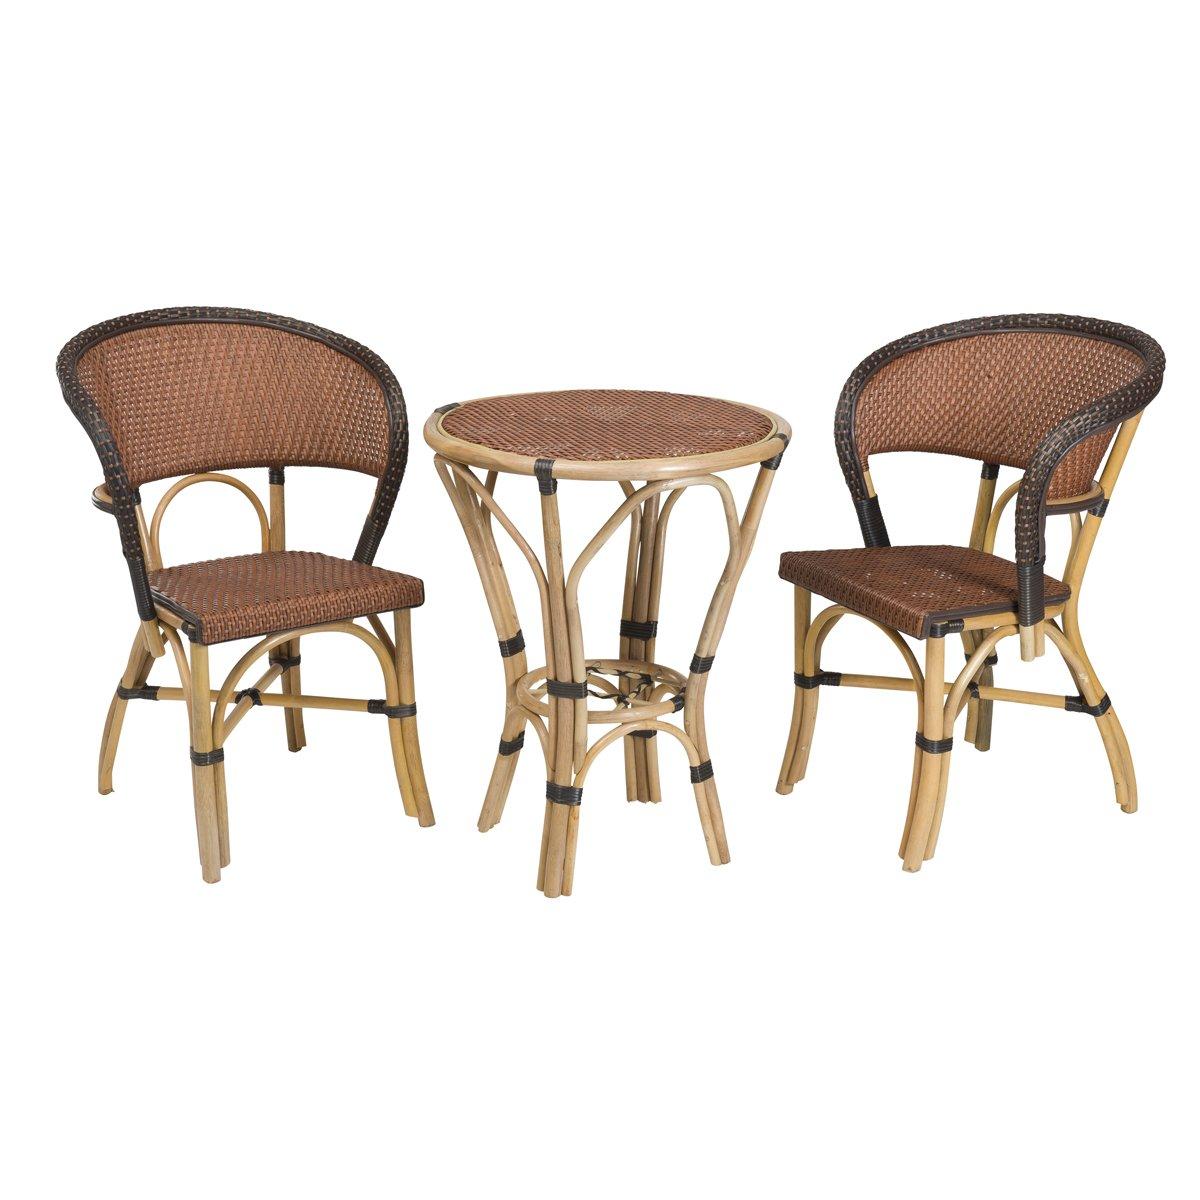 Rattan-Möbel Set BISTRO Mokka n°3 - Gartenmöbel aus Polyrattan/Bambus - Braun